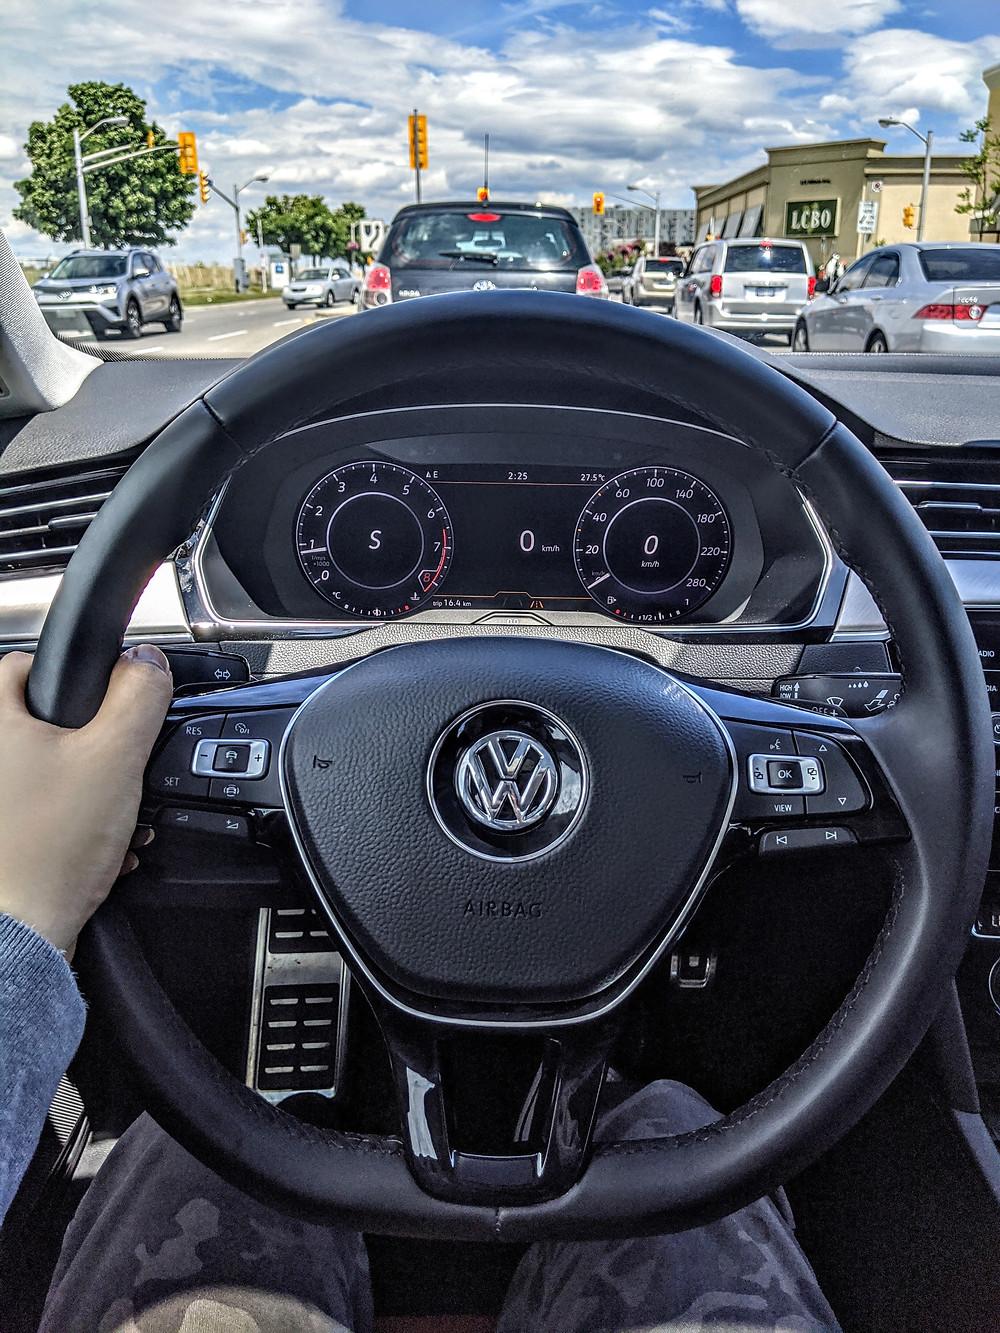 Volkswagen Arteon Behind The Wheel POV Interior